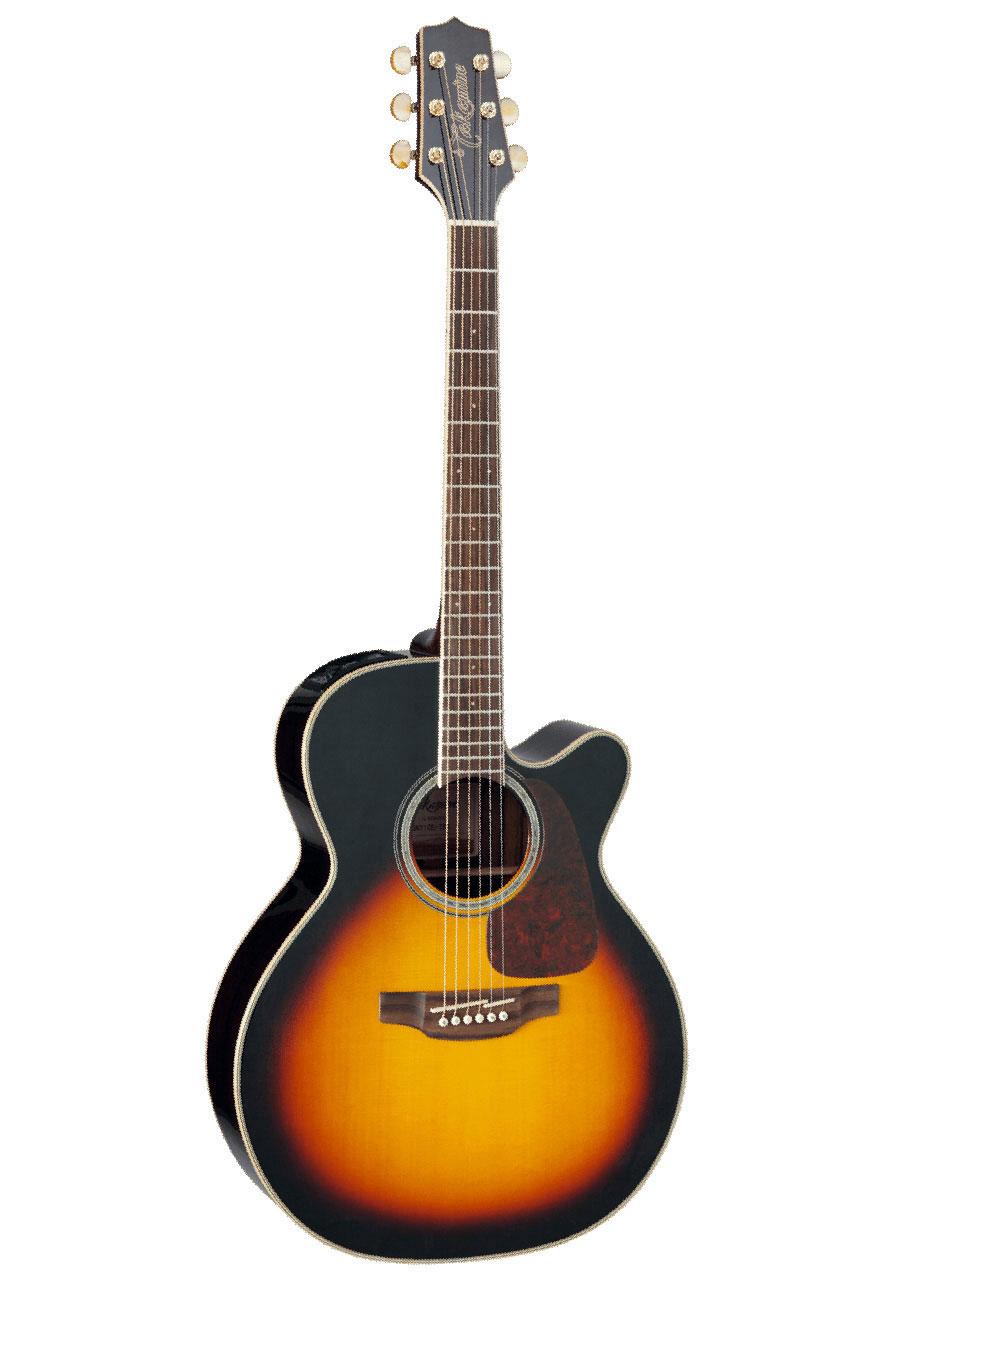 Fender Gn71ce Brown Sunburst